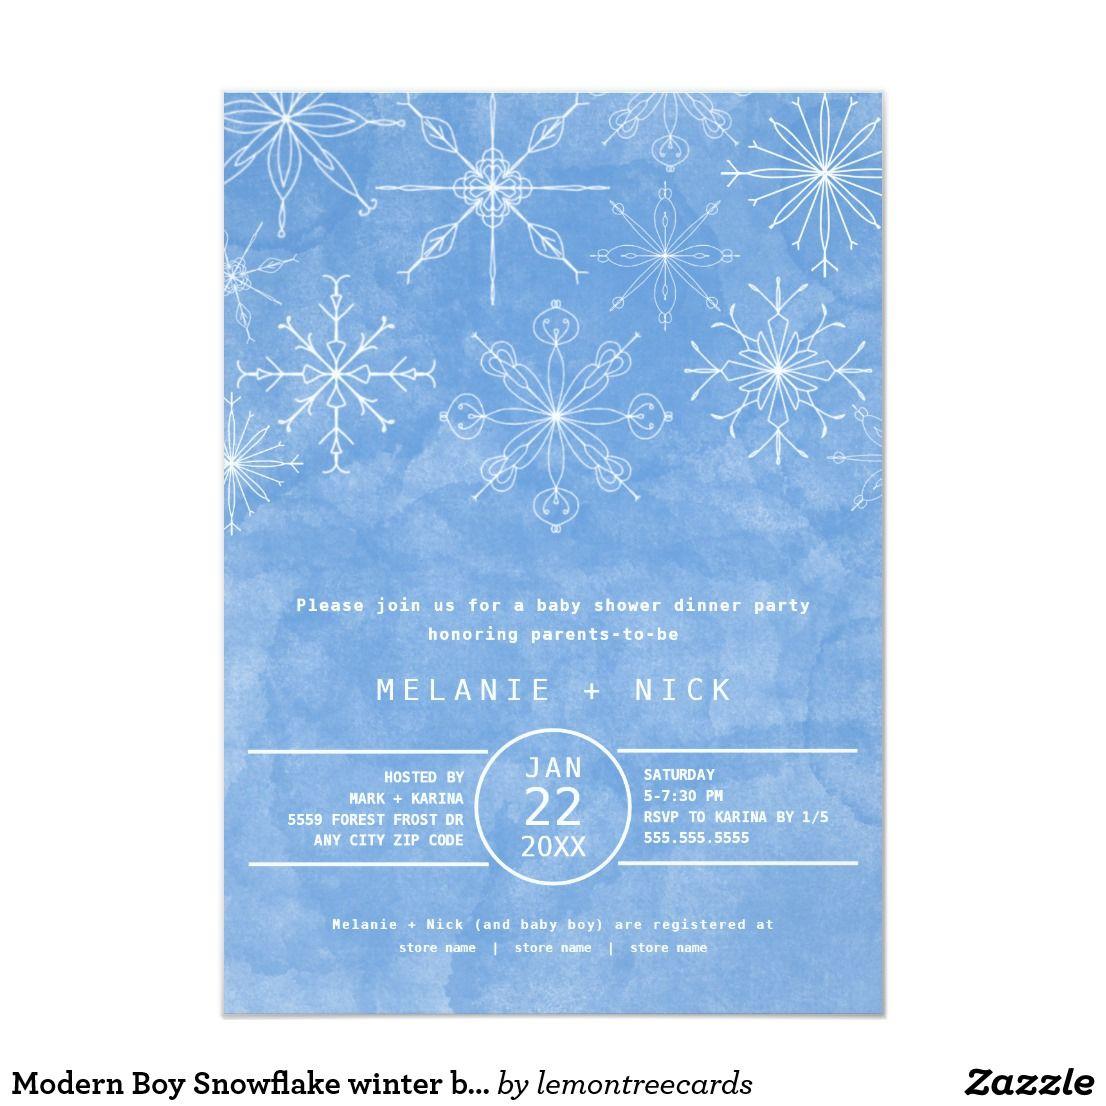 Modern Boy Snowflake winter baby shower Invitation